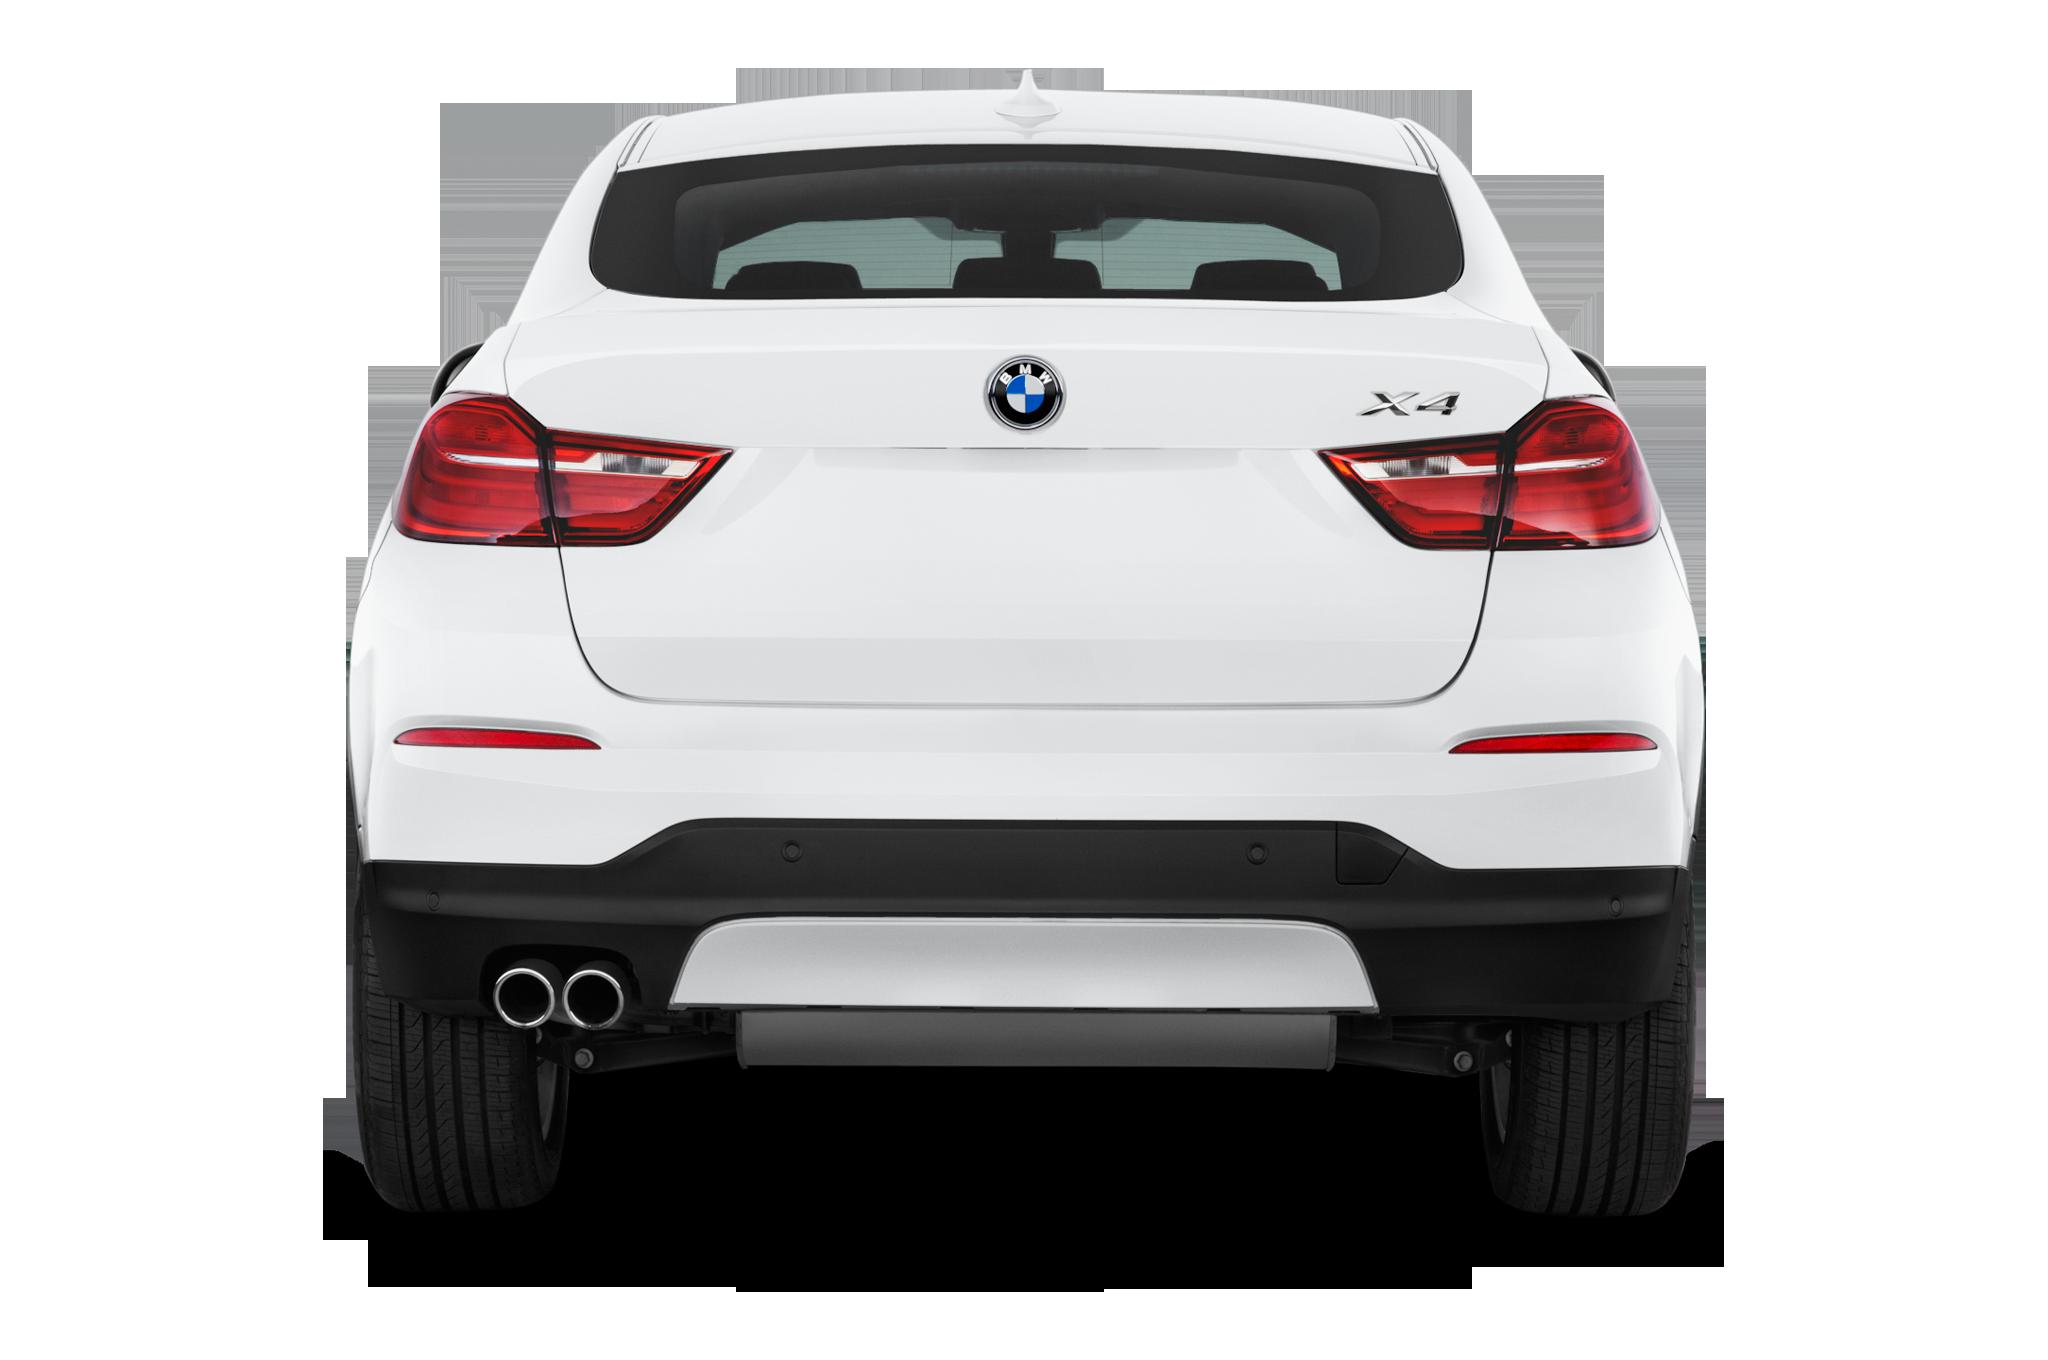 Bmw X3 2018 Pricing >> BMW X2 Concept Debuts in Paris | Automobile Magazine